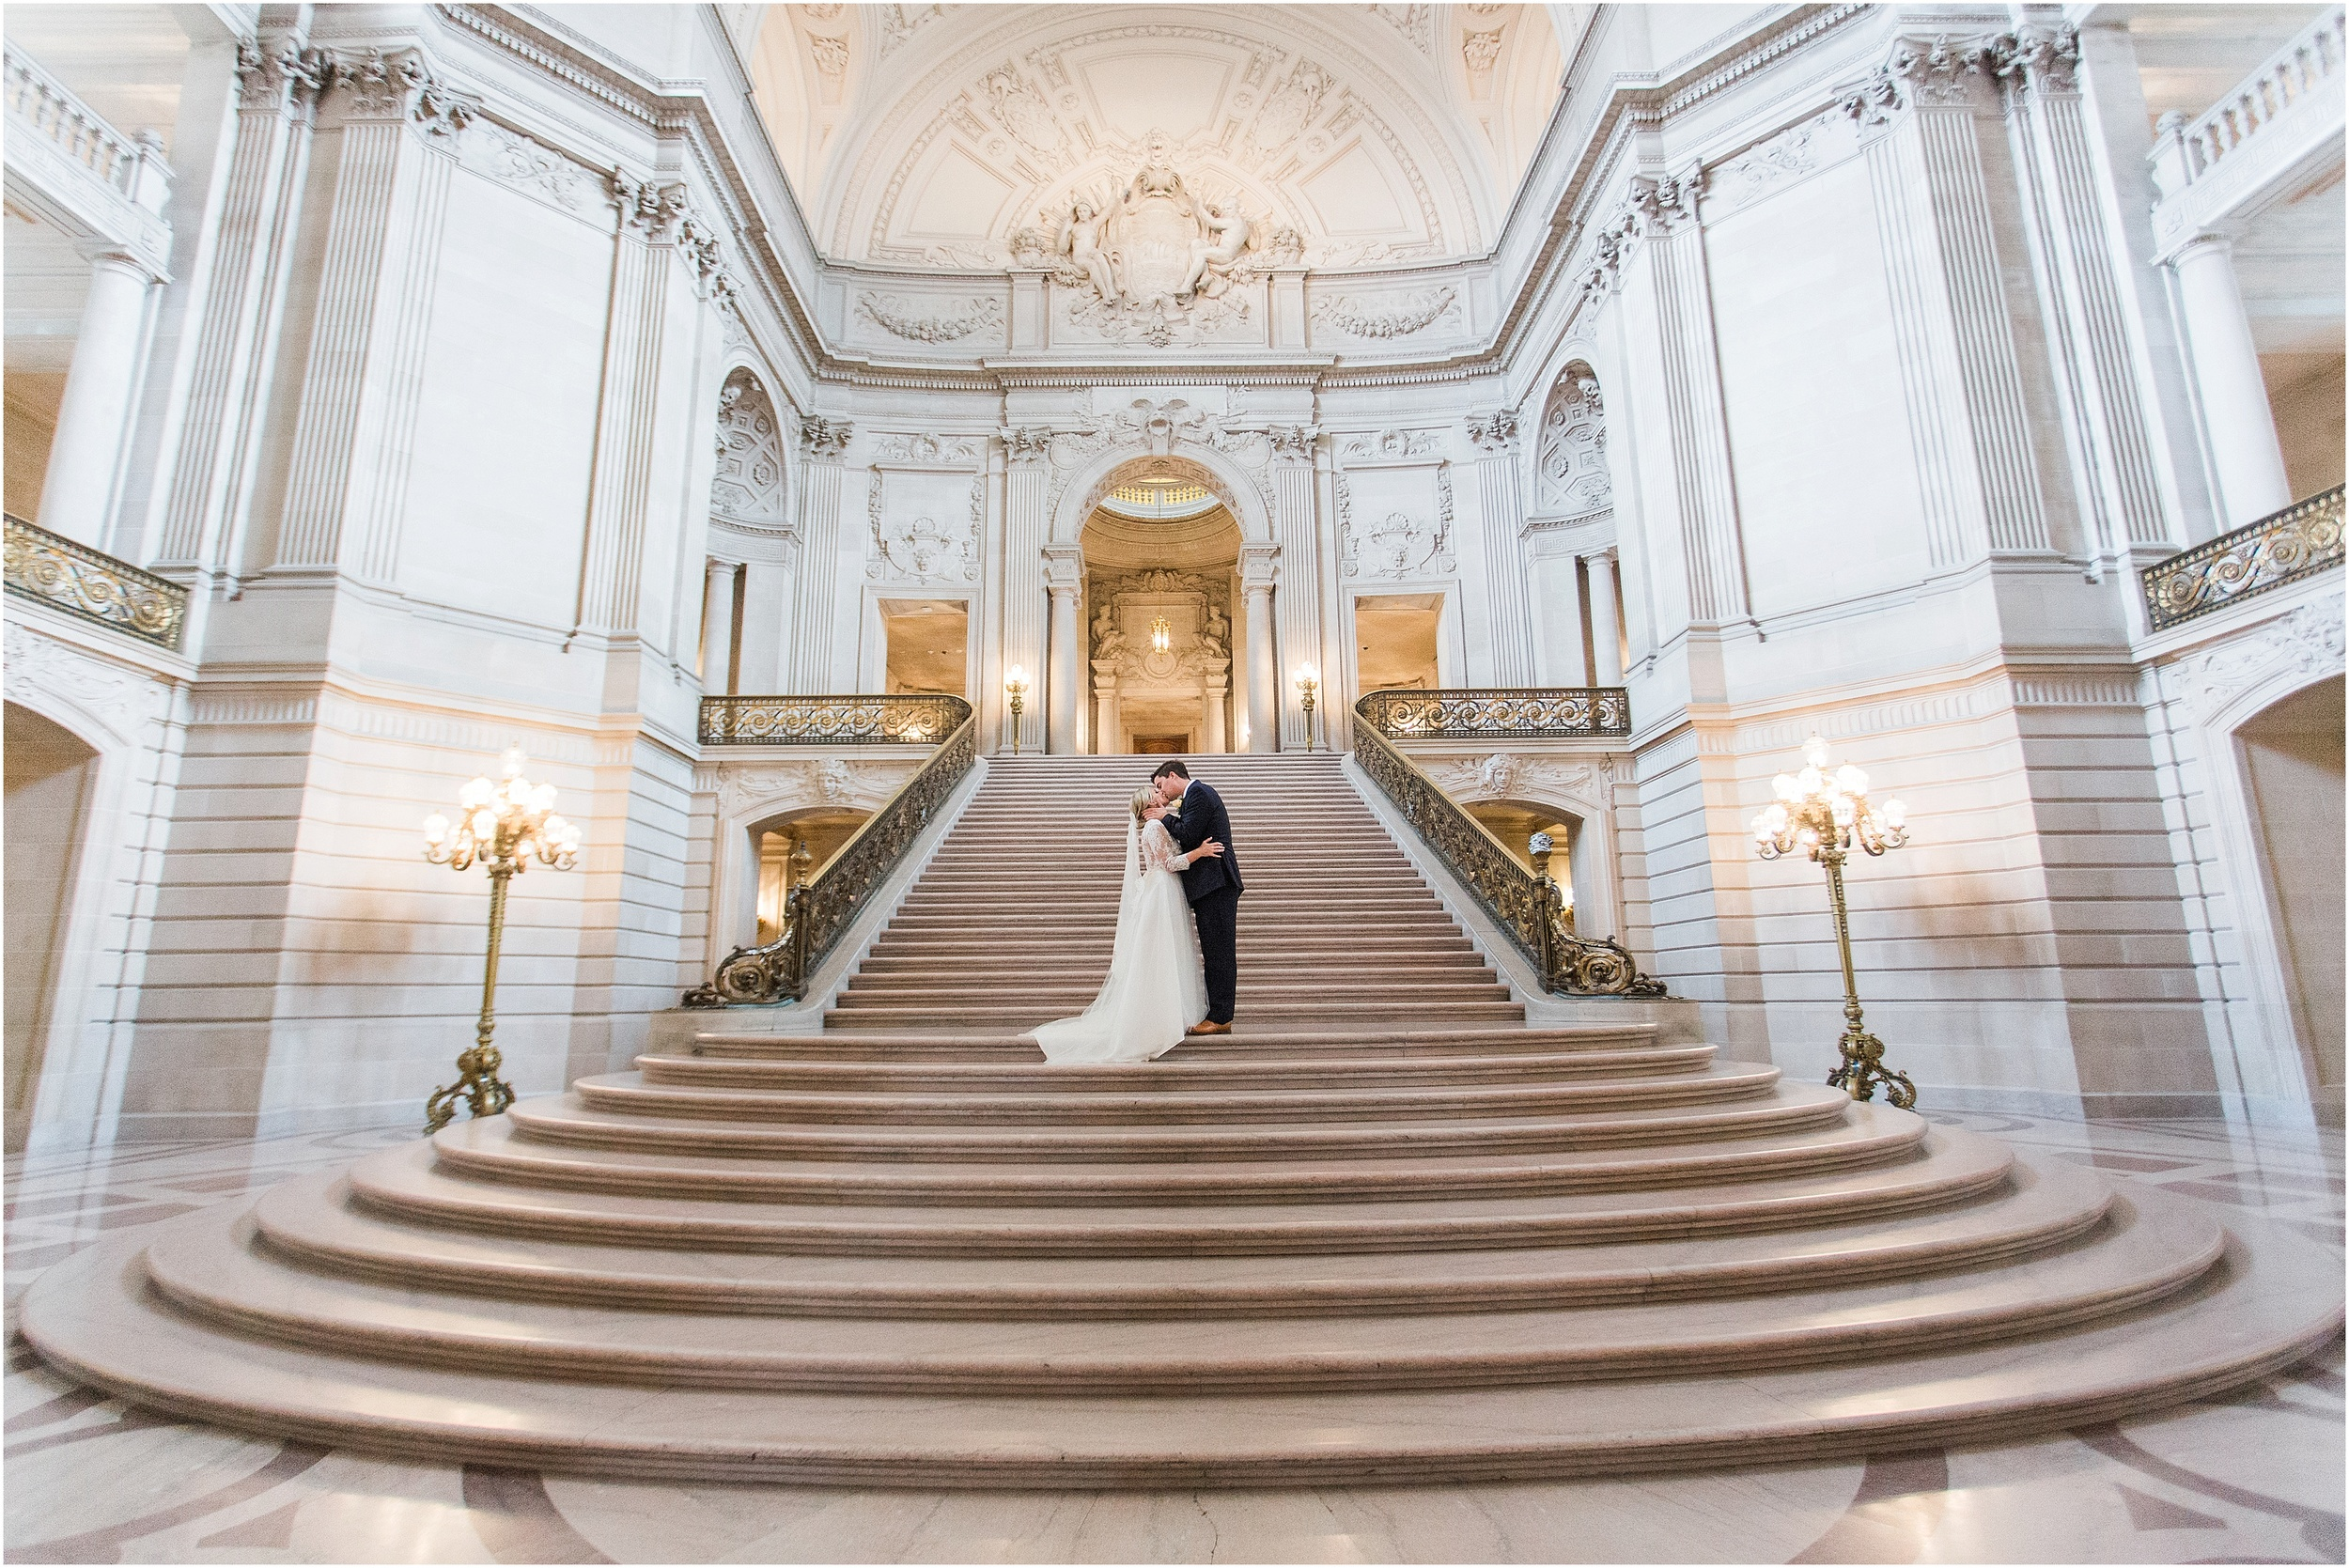 blueberryphotography.com   San Francisco City Hall Wedding   Blueberry Photography   Destination Wedding Photographer   Wedding Photography at SF City Hall